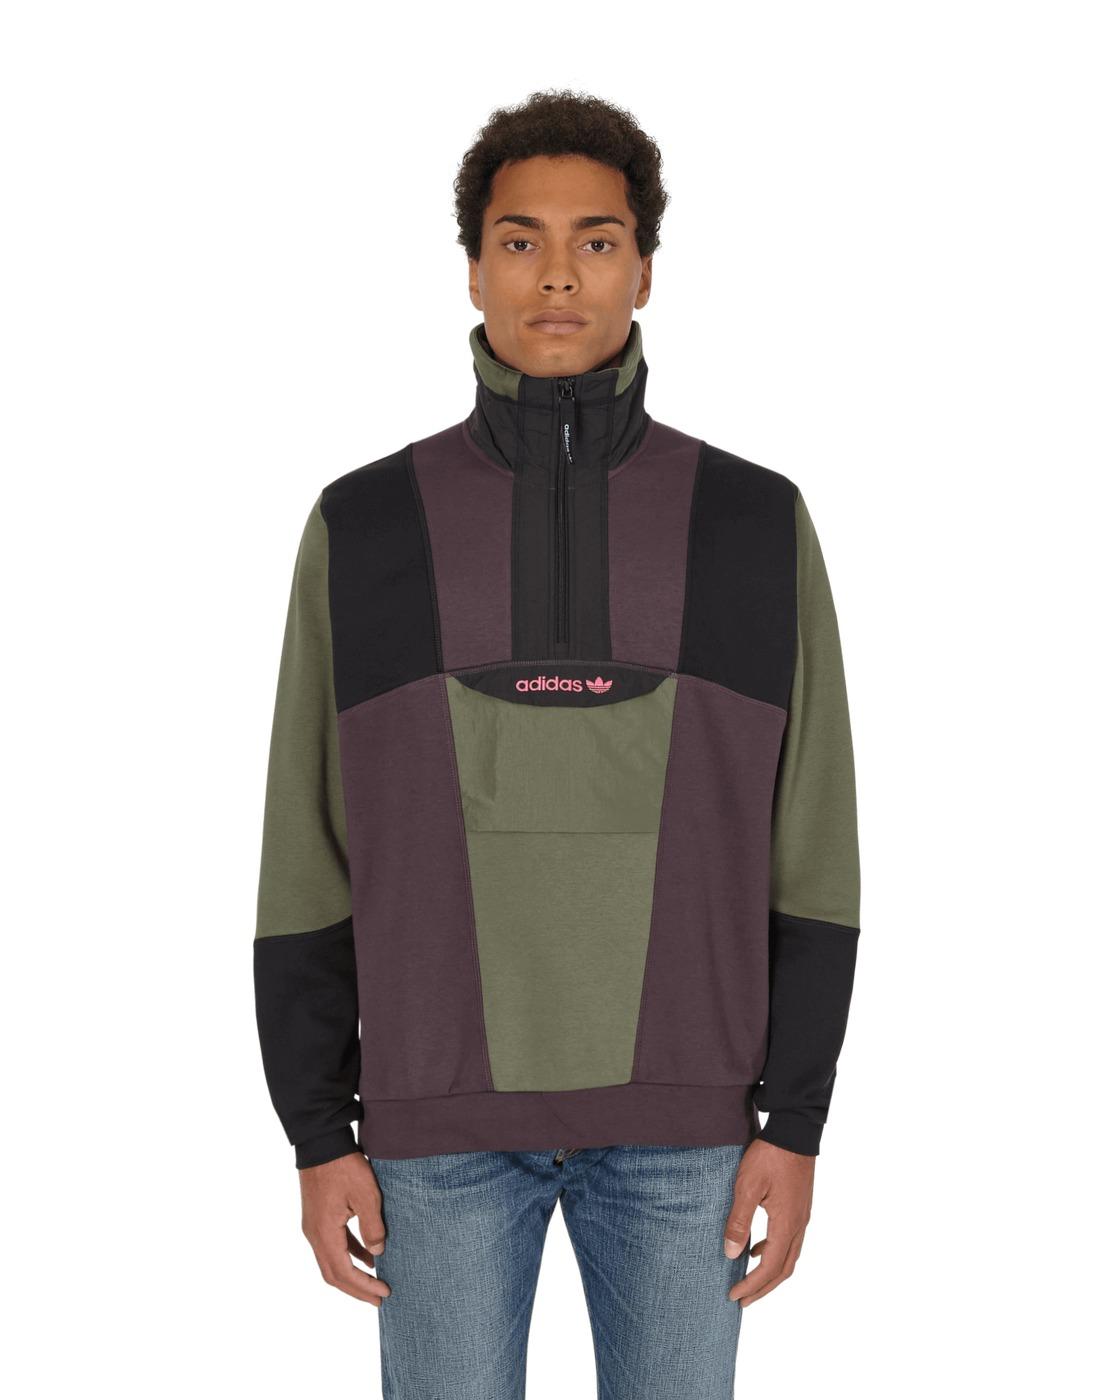 Adidas Originals Adventure Field Half Zip Sweatshirt Multi